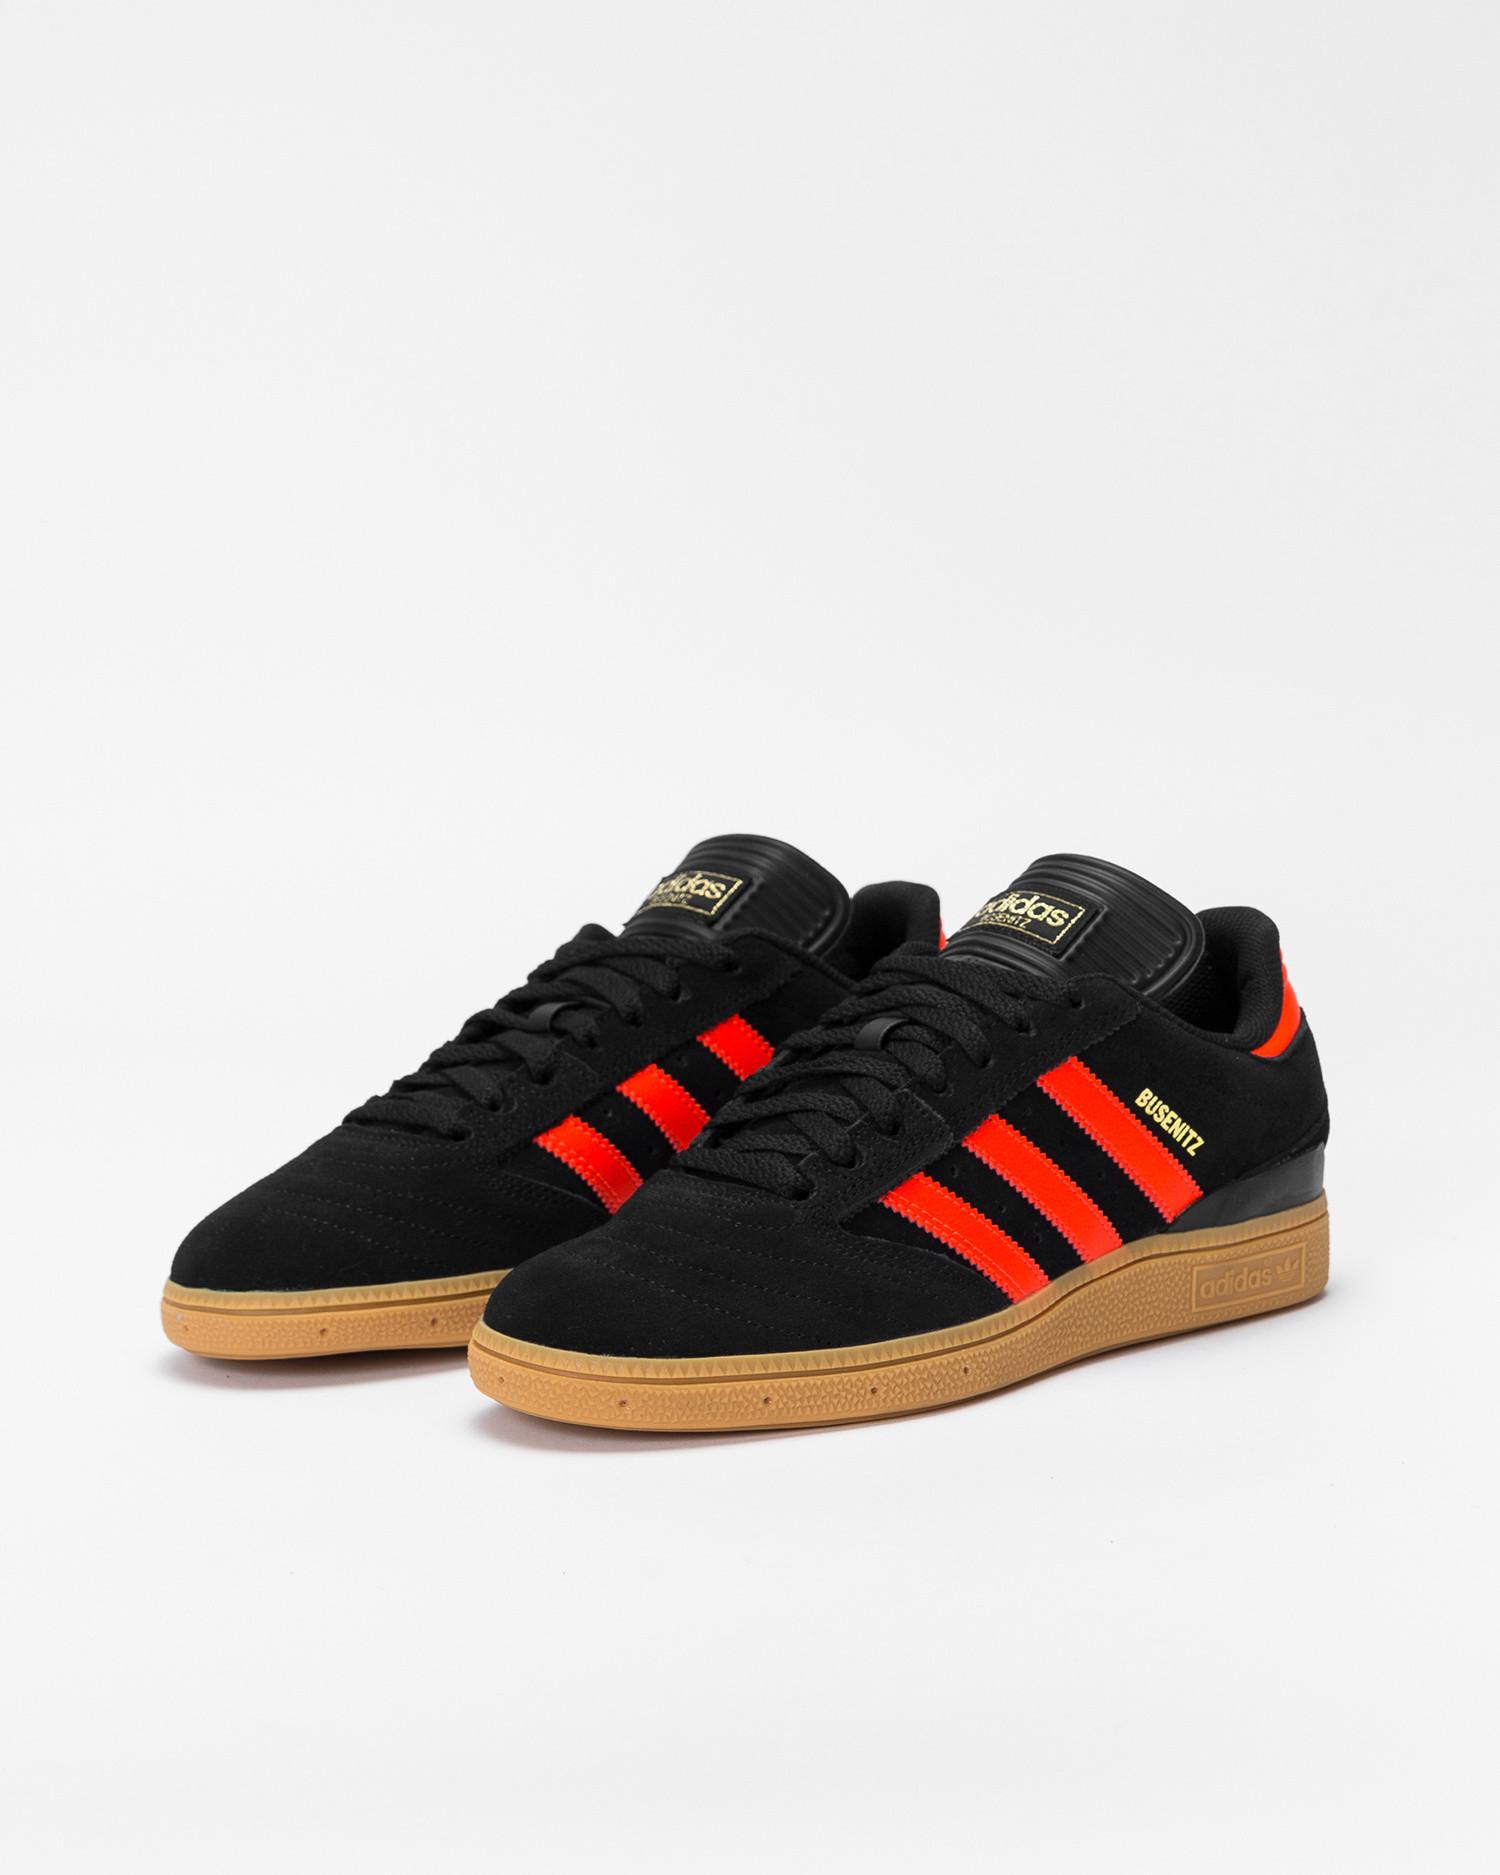 Adidas Busenitz Cblack/Solred/Gum1